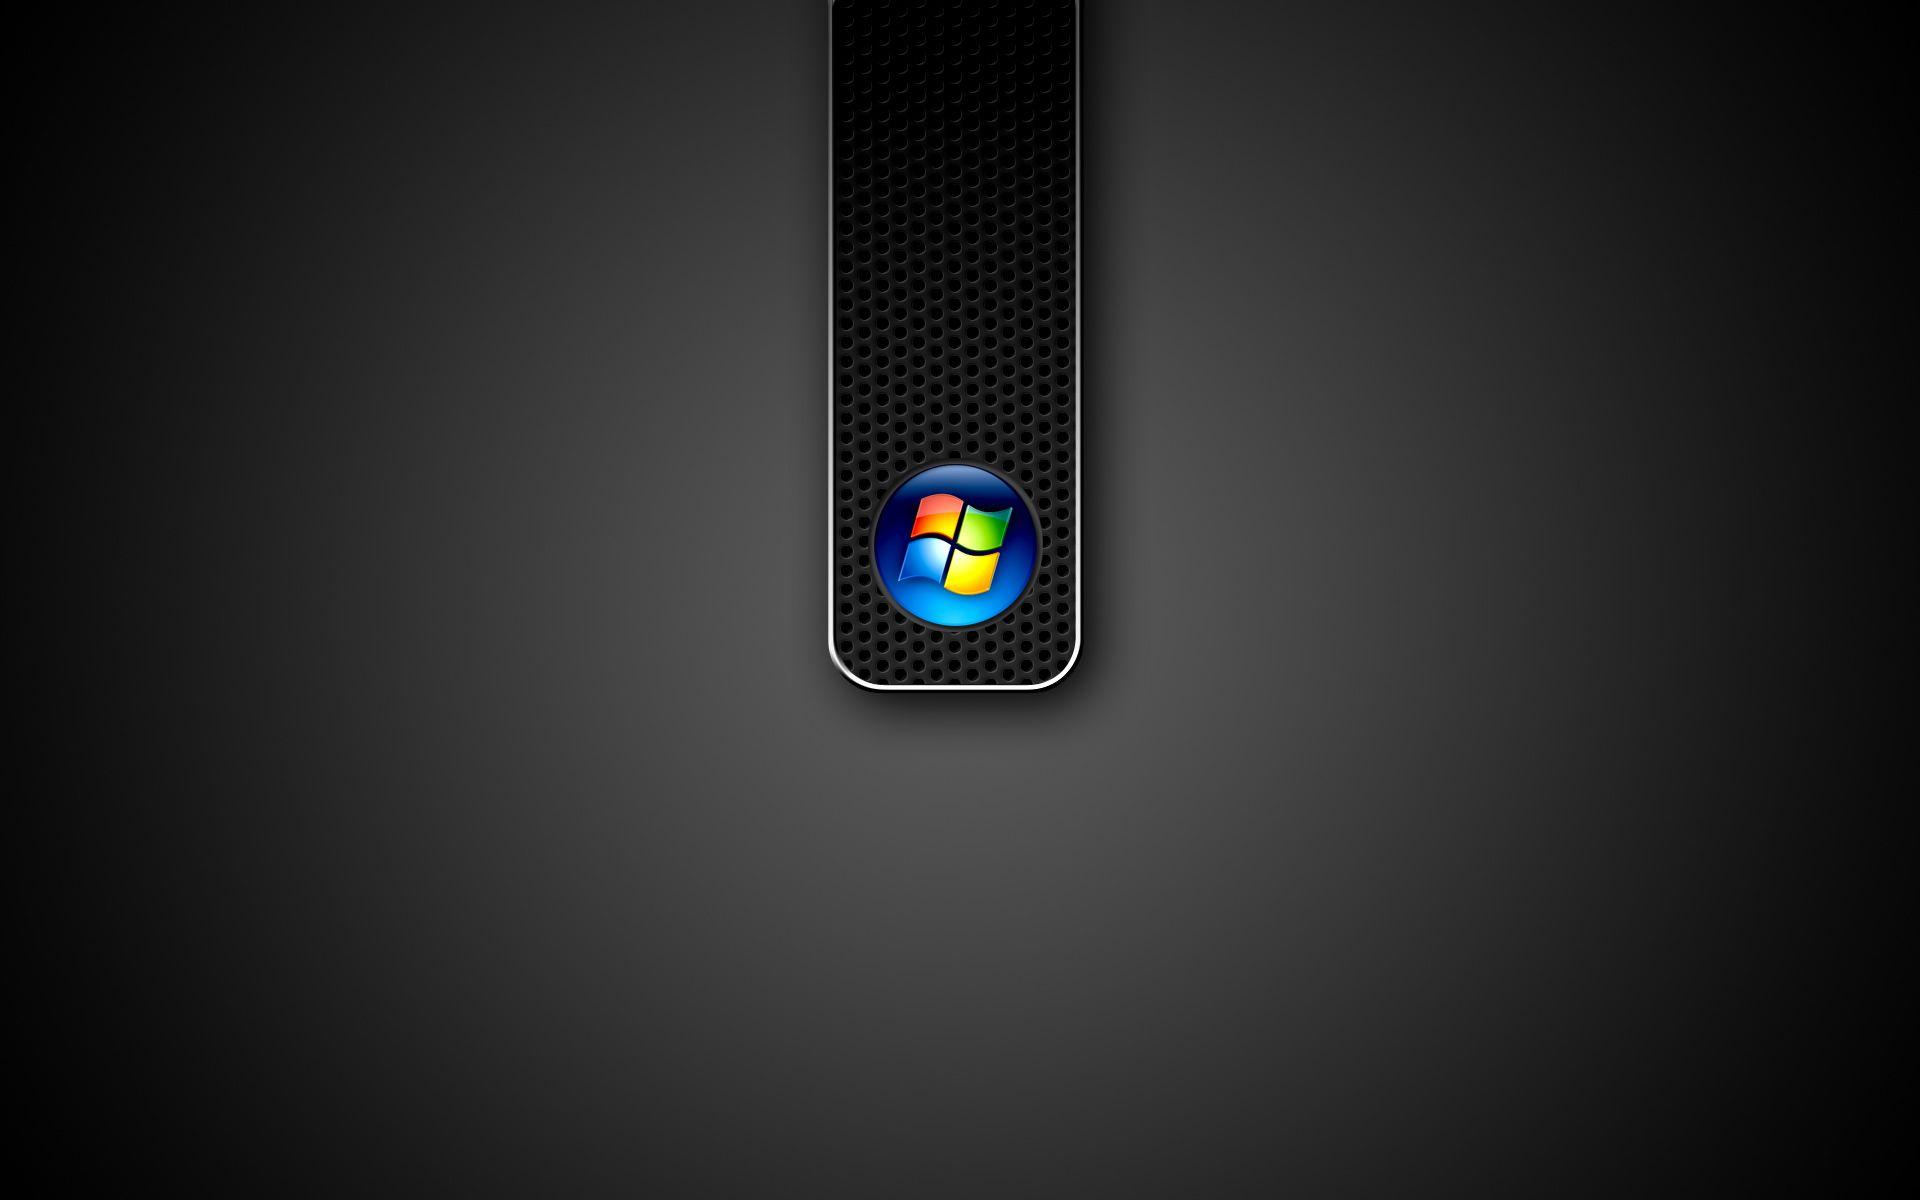 Windows Wallpapers HD - Wallpaper Cave